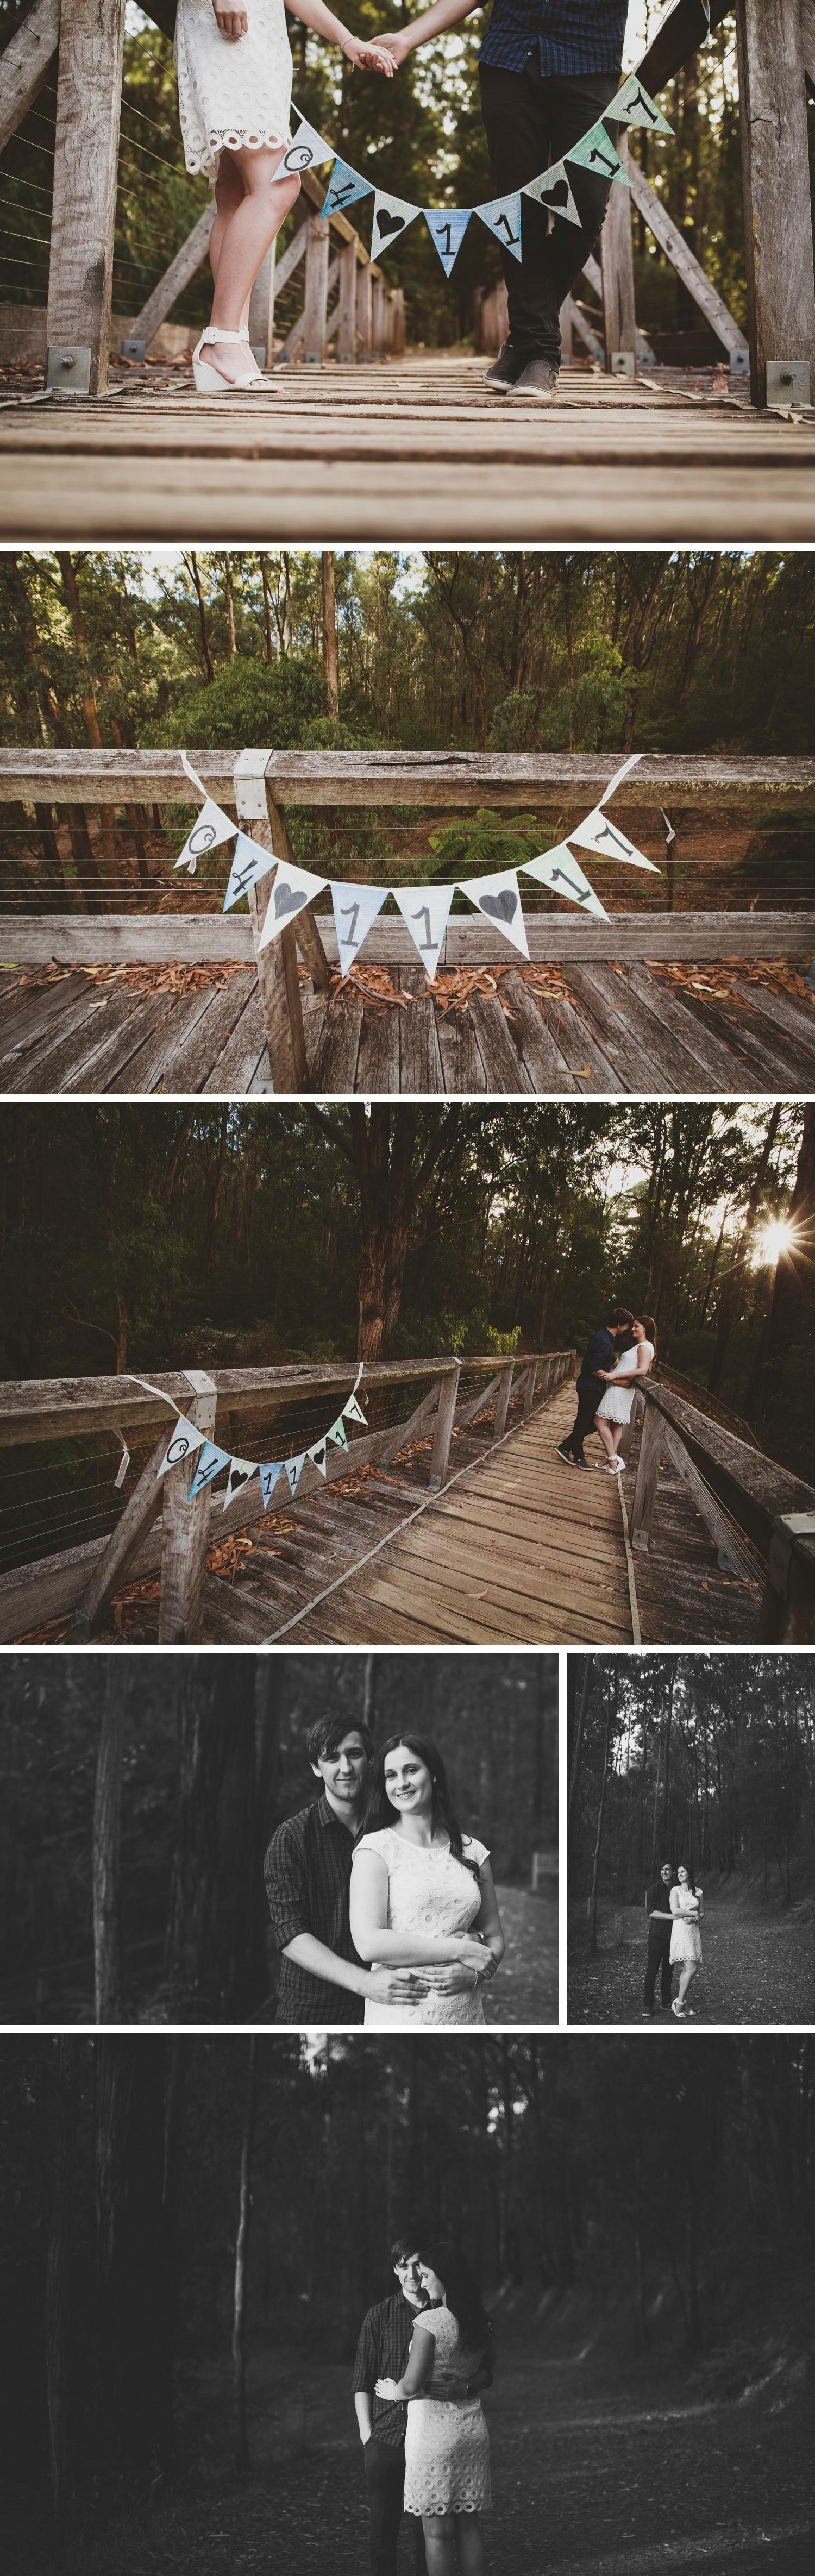 Noojee Tressle Bridge Photos, Engagement Shoot Noojee Victoria, Rainforest Shoot by Danae Studios